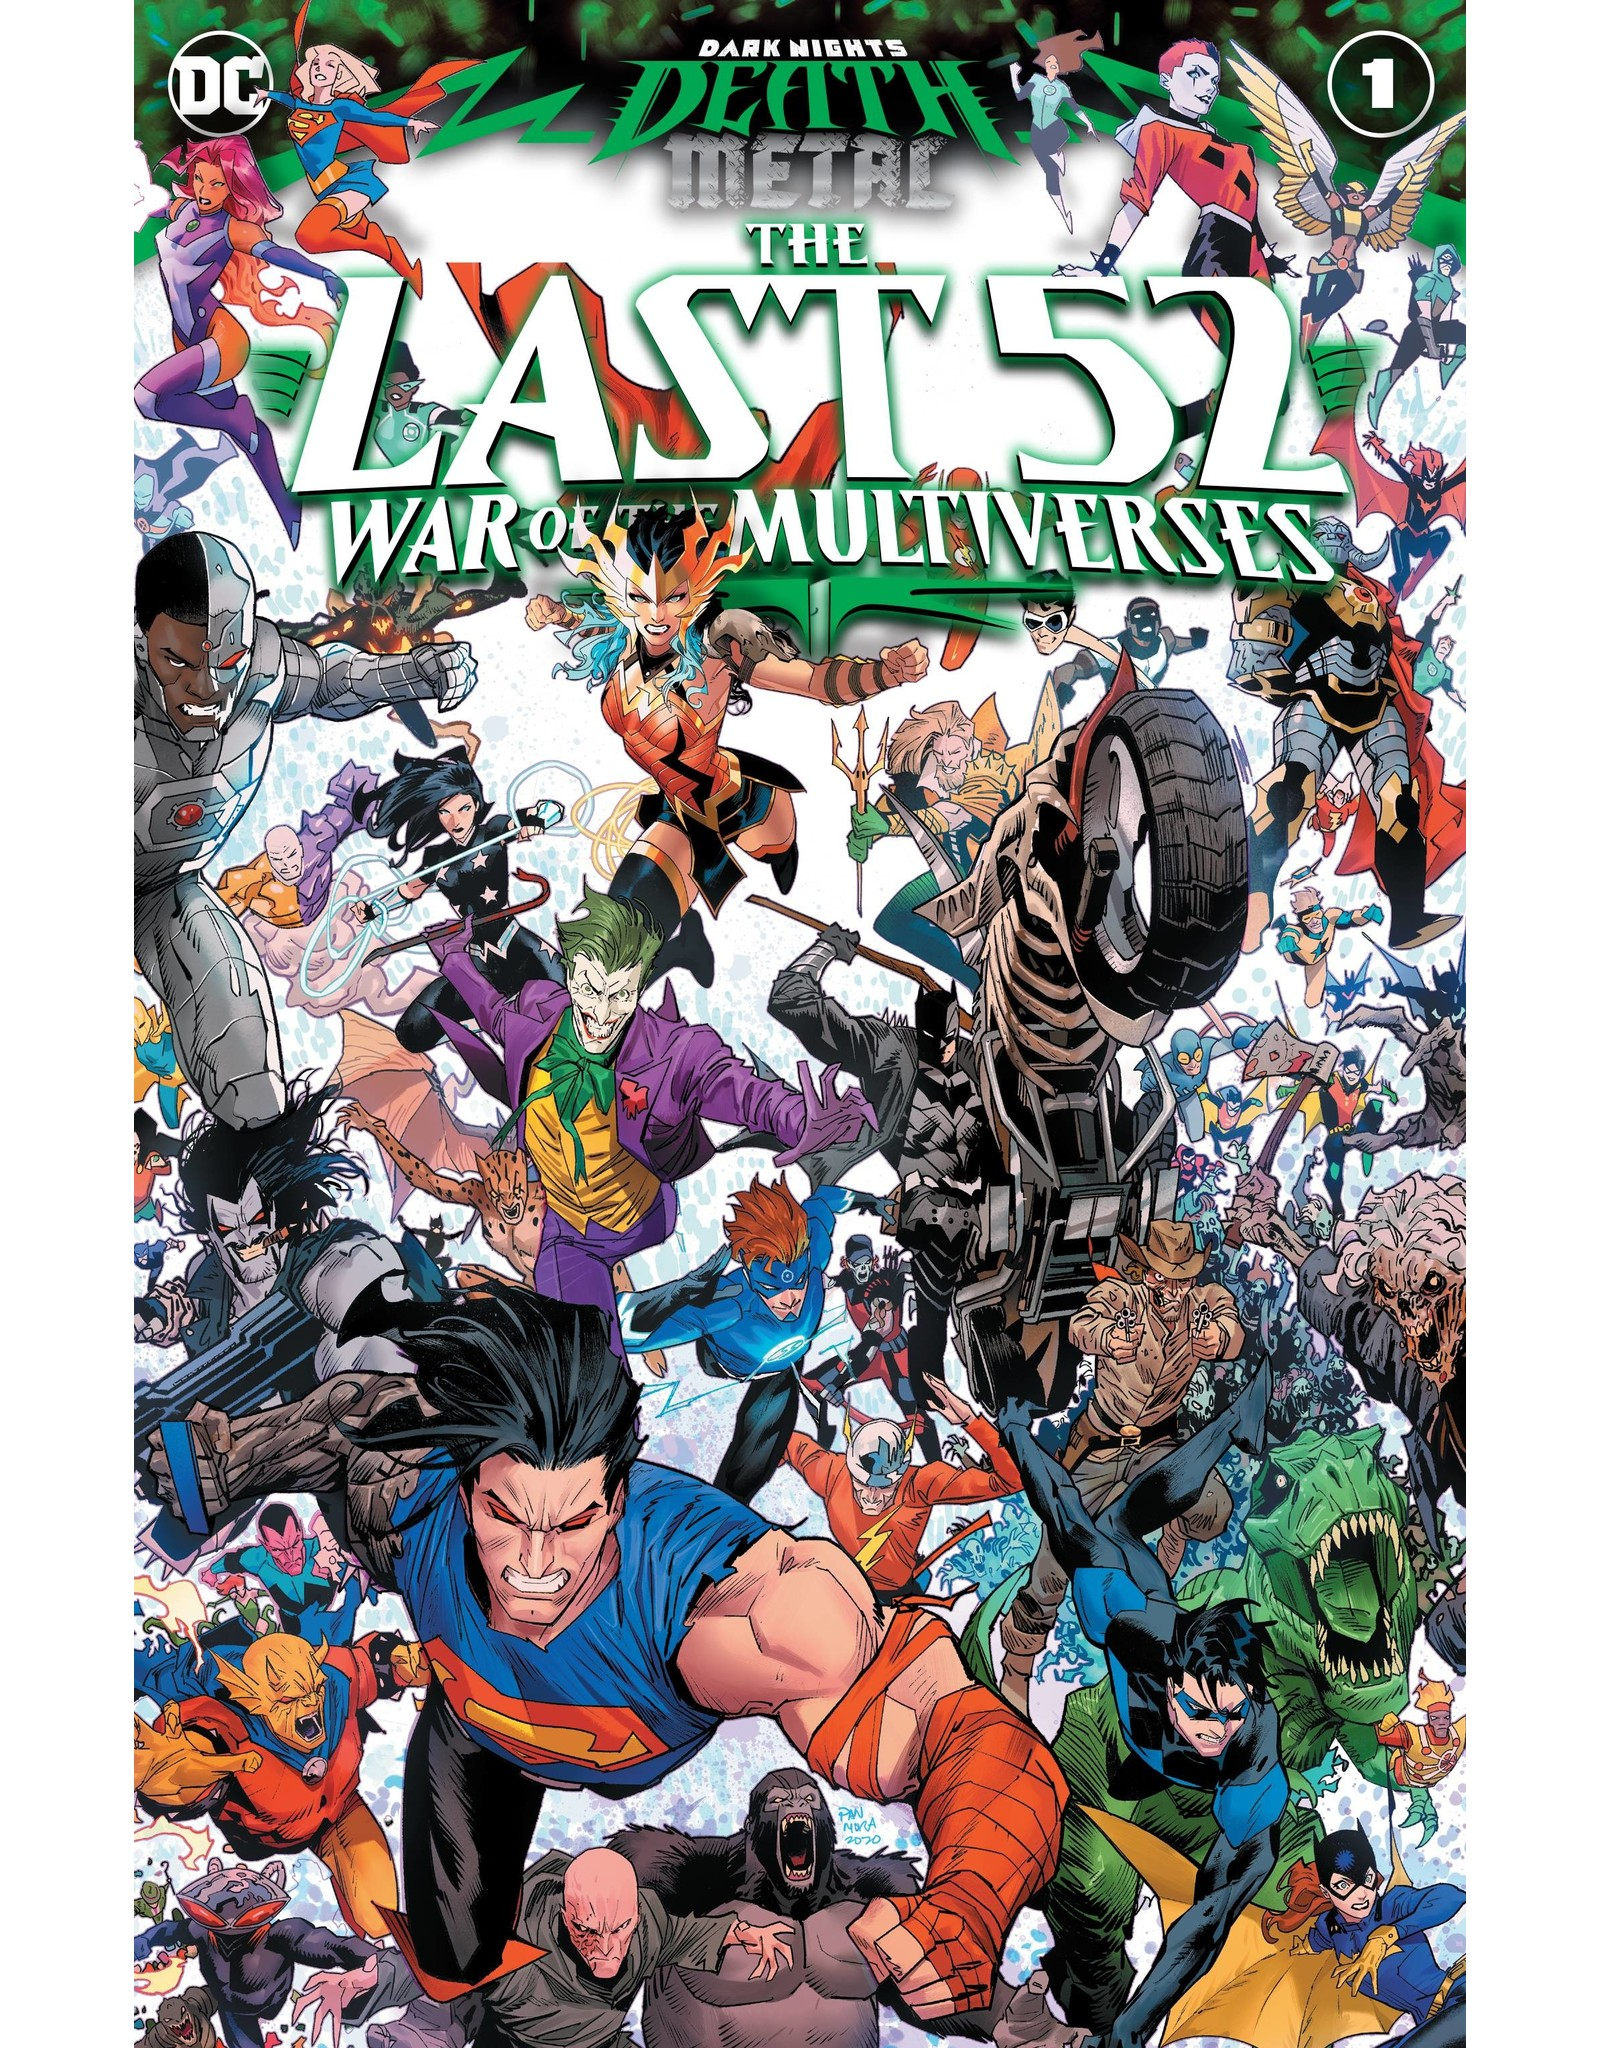 DC COMICS DARK NIGHTS DEATH METAL THE LAST 52 WAR OF THE MULTIVERSES #1 (ONE SHOT) CVR A DAN MORA